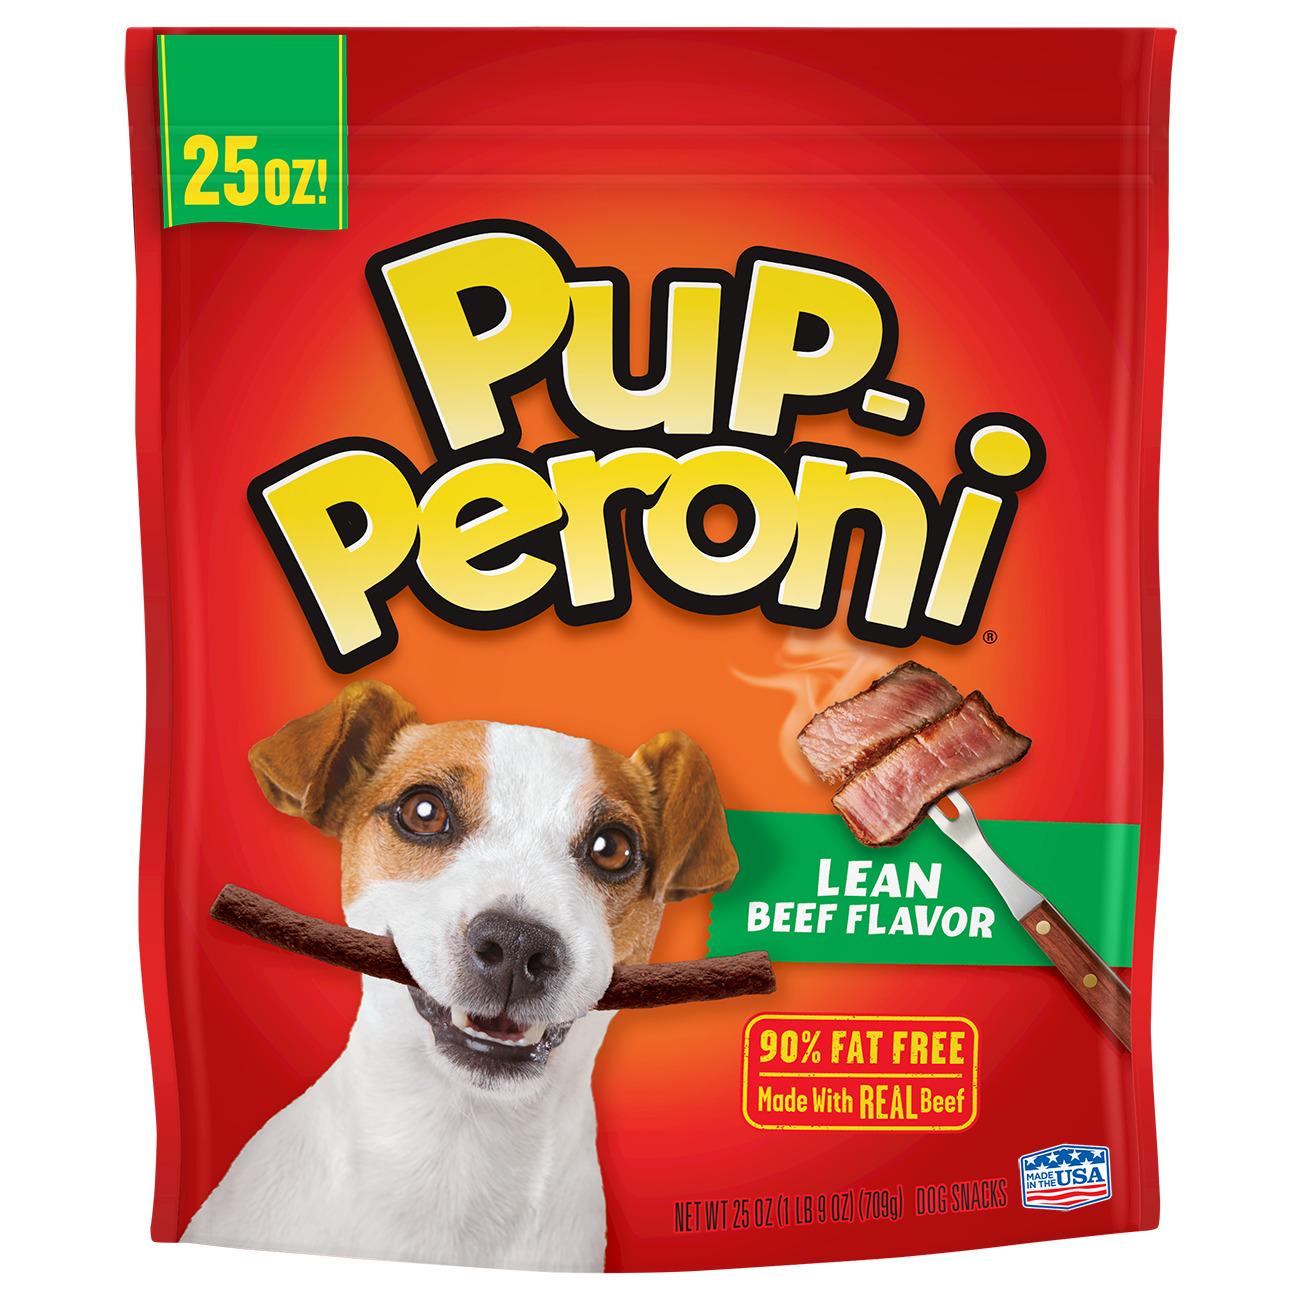 Pup-Peroni Dog Treats Lean Beef Flavor, 25.0 OZ by Big Heart Pet Brands